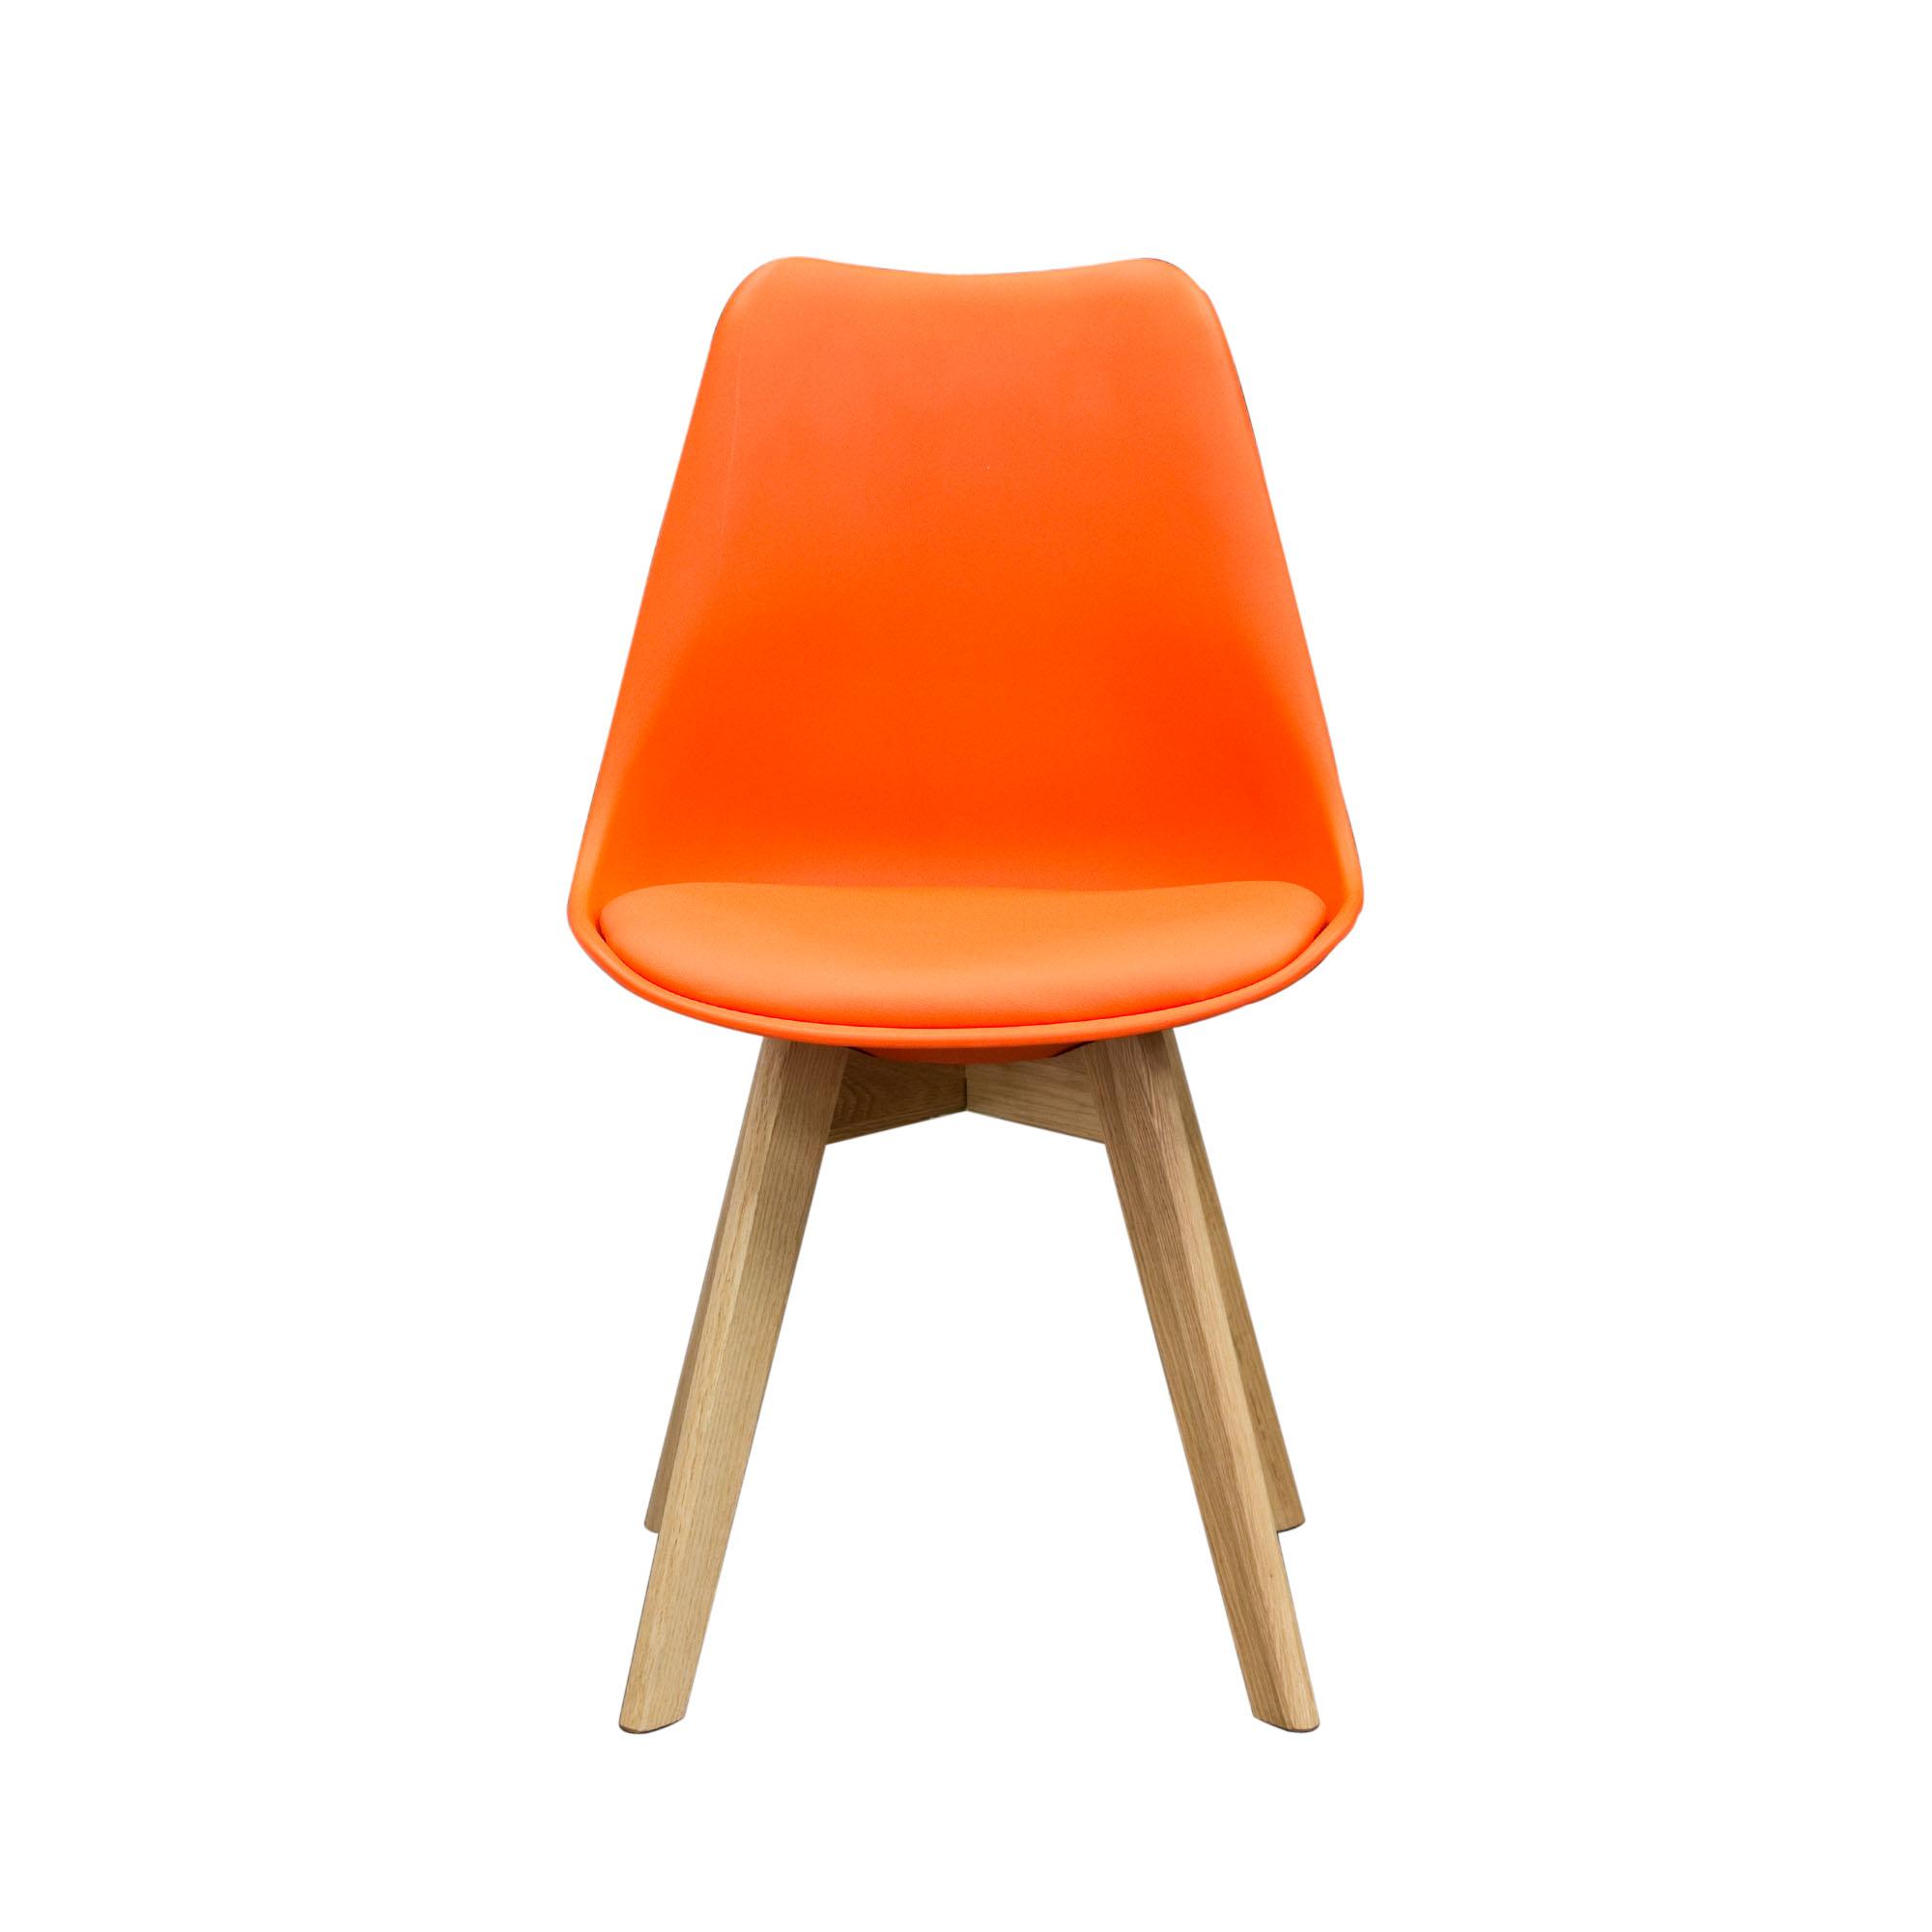 Diamond Sofa Coda Set of Two Dining Side Chairs - Item Number: CODACHOR